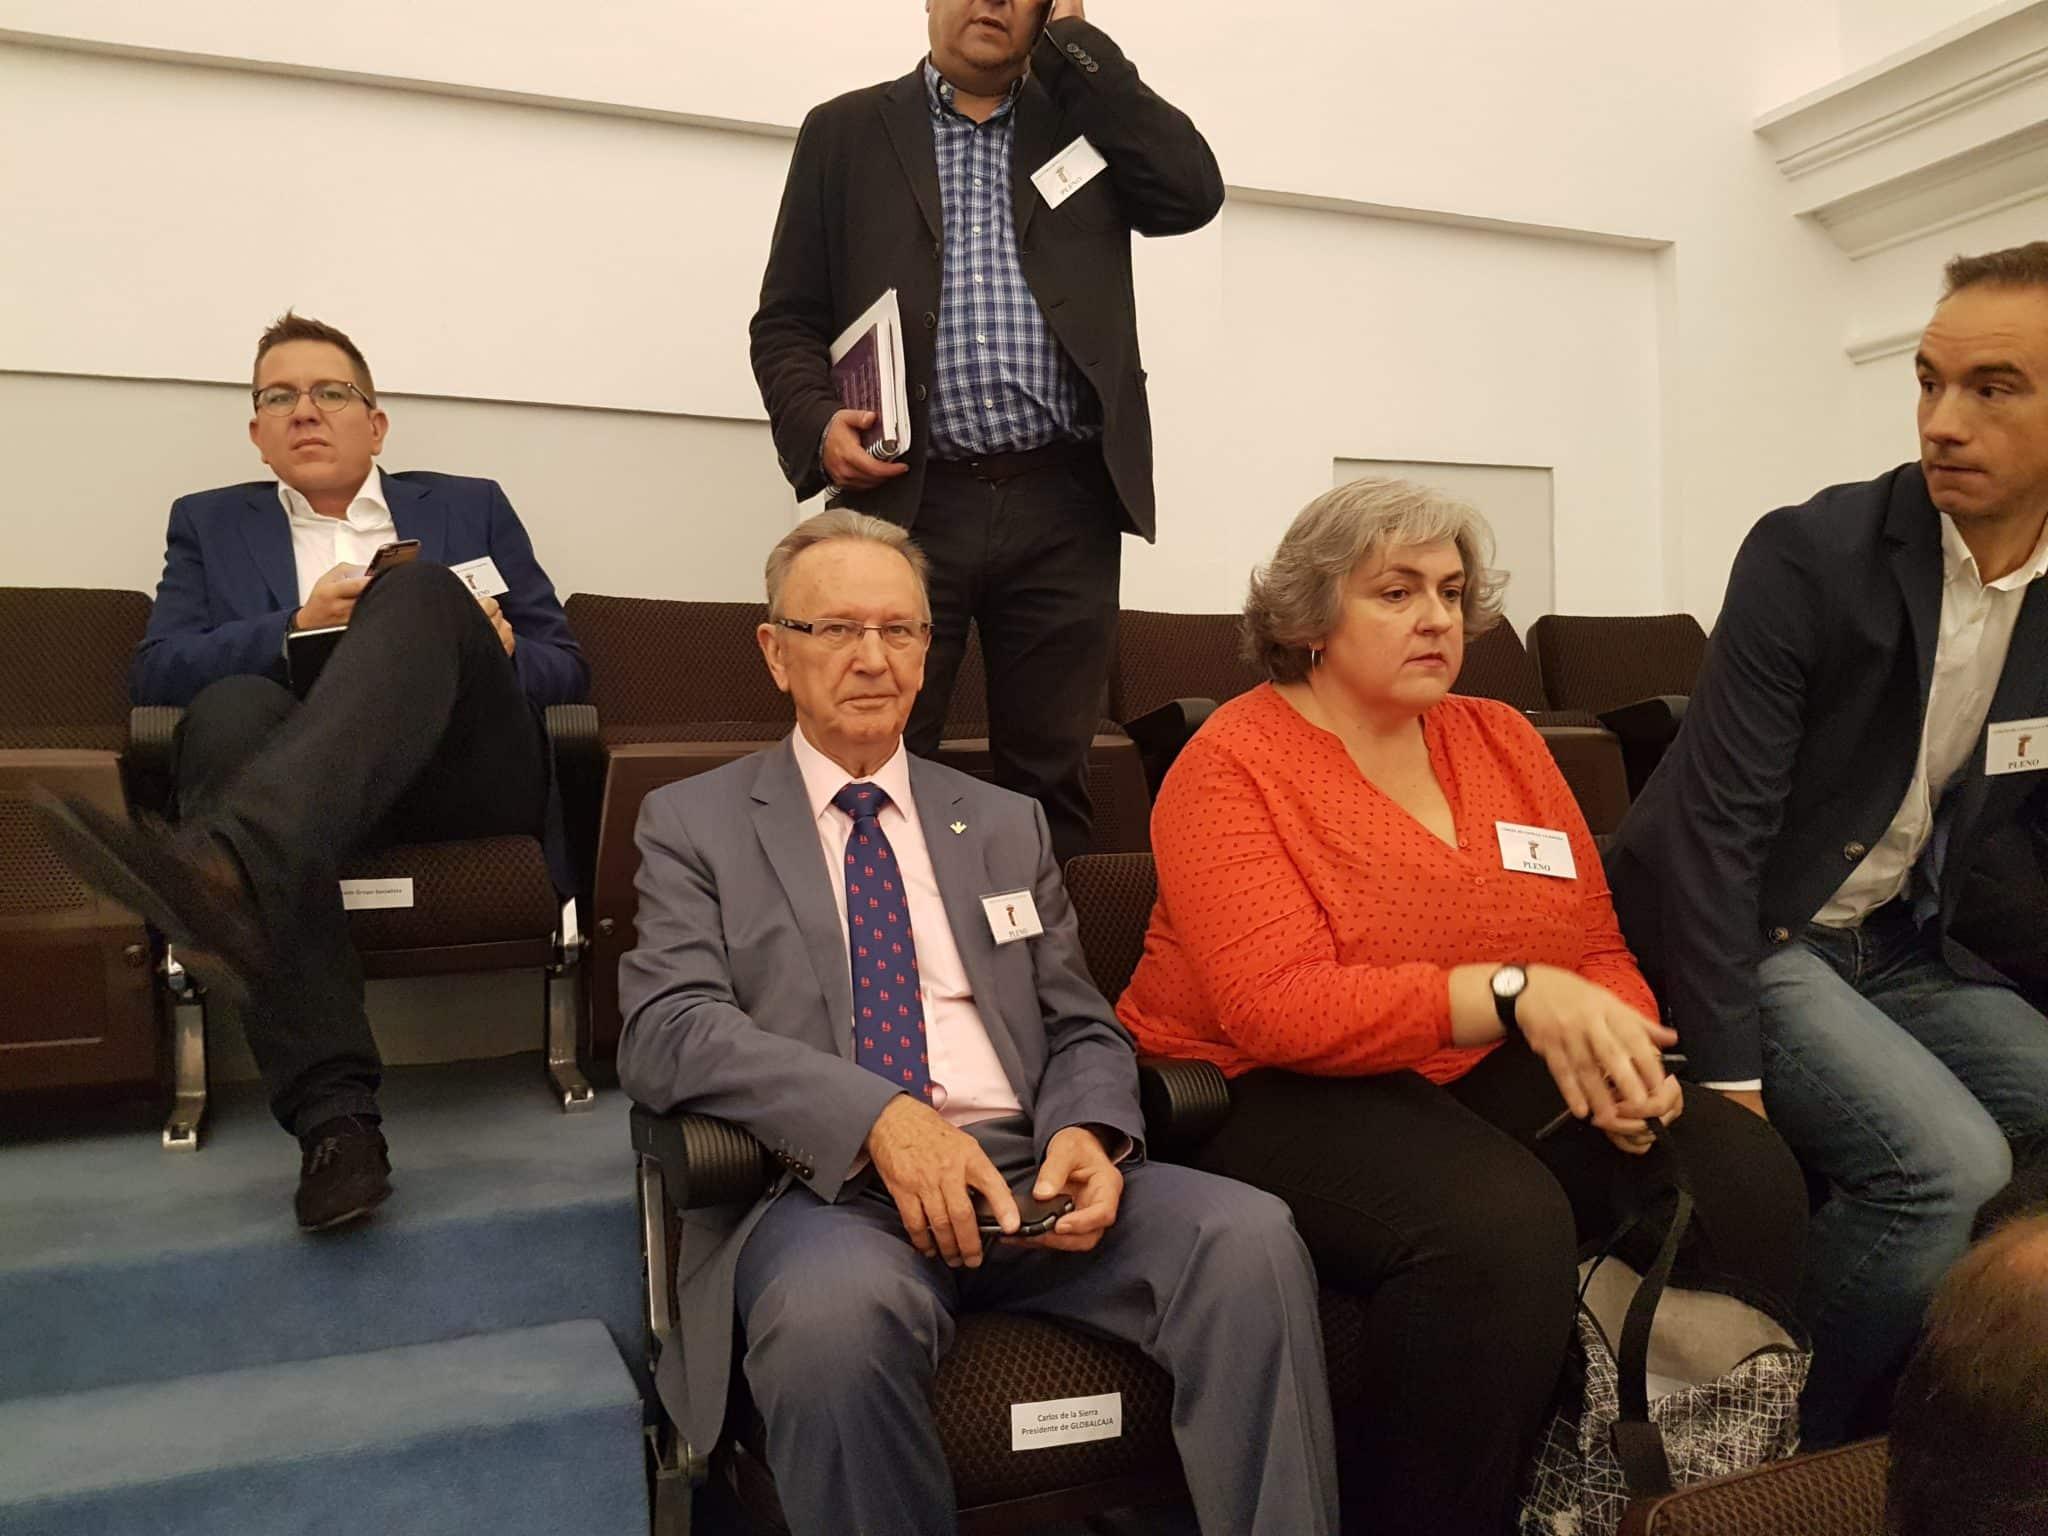 https://blog.globalcaja.es/wp-content/uploads/2017/10/Debate-estado-de-la-region.jpg